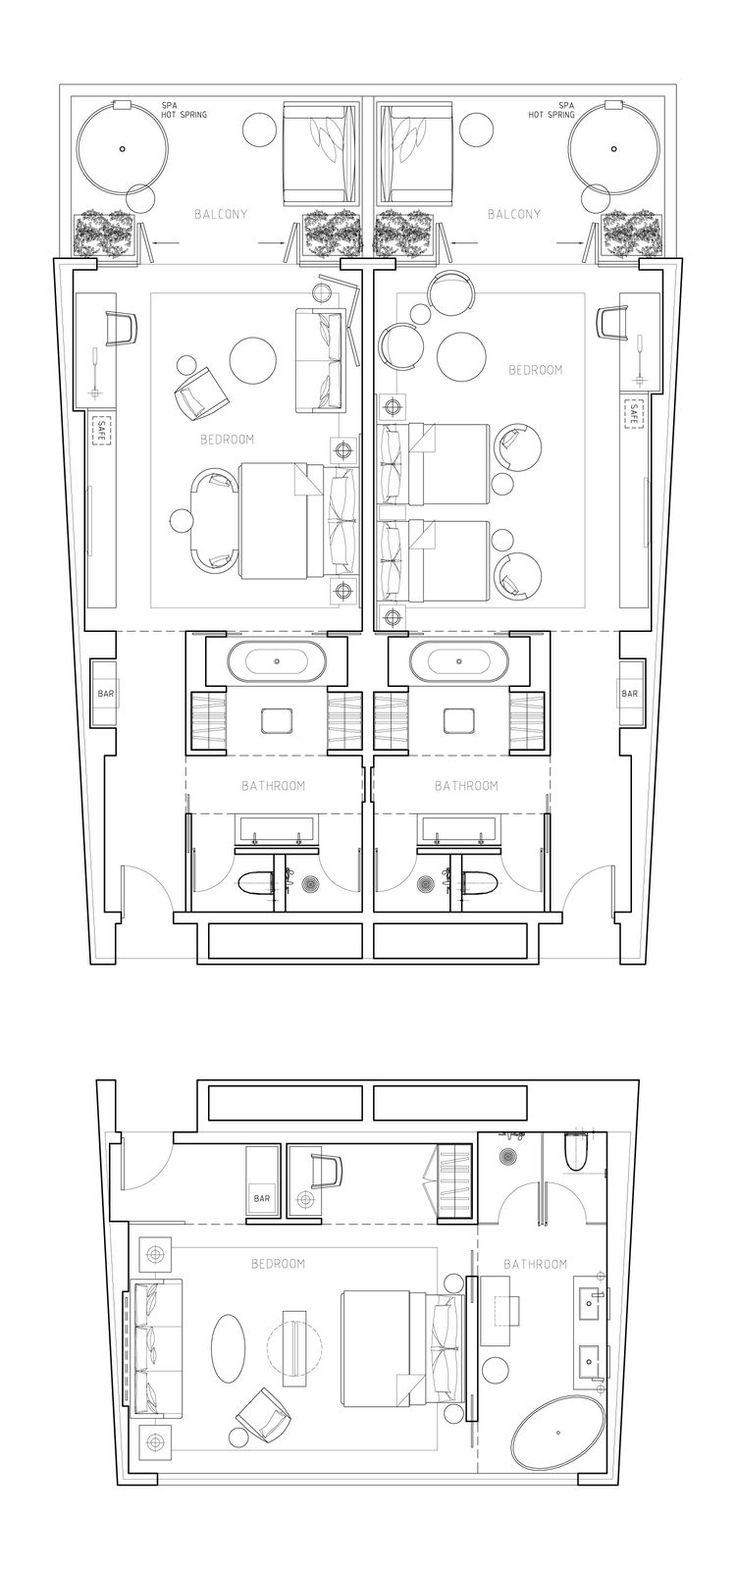 Hotel Room Plan: 697f0ab6dc282b3bd6d02b25750b73d9.jpg 750×1,600 Pixels